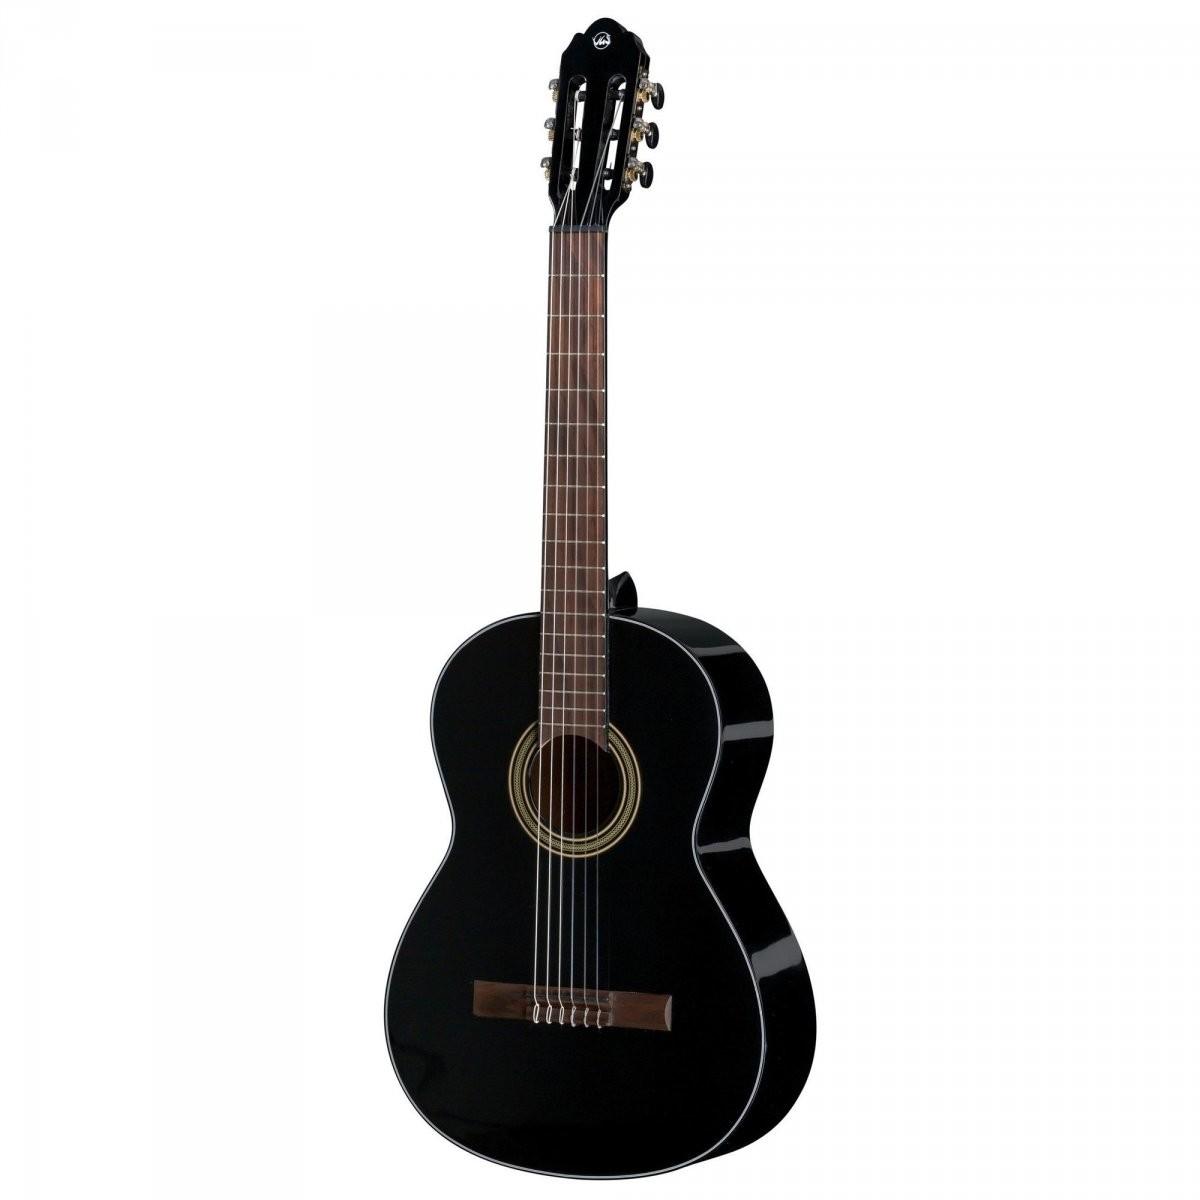 Gewa 500142 BL gitara klasyczna 4/4